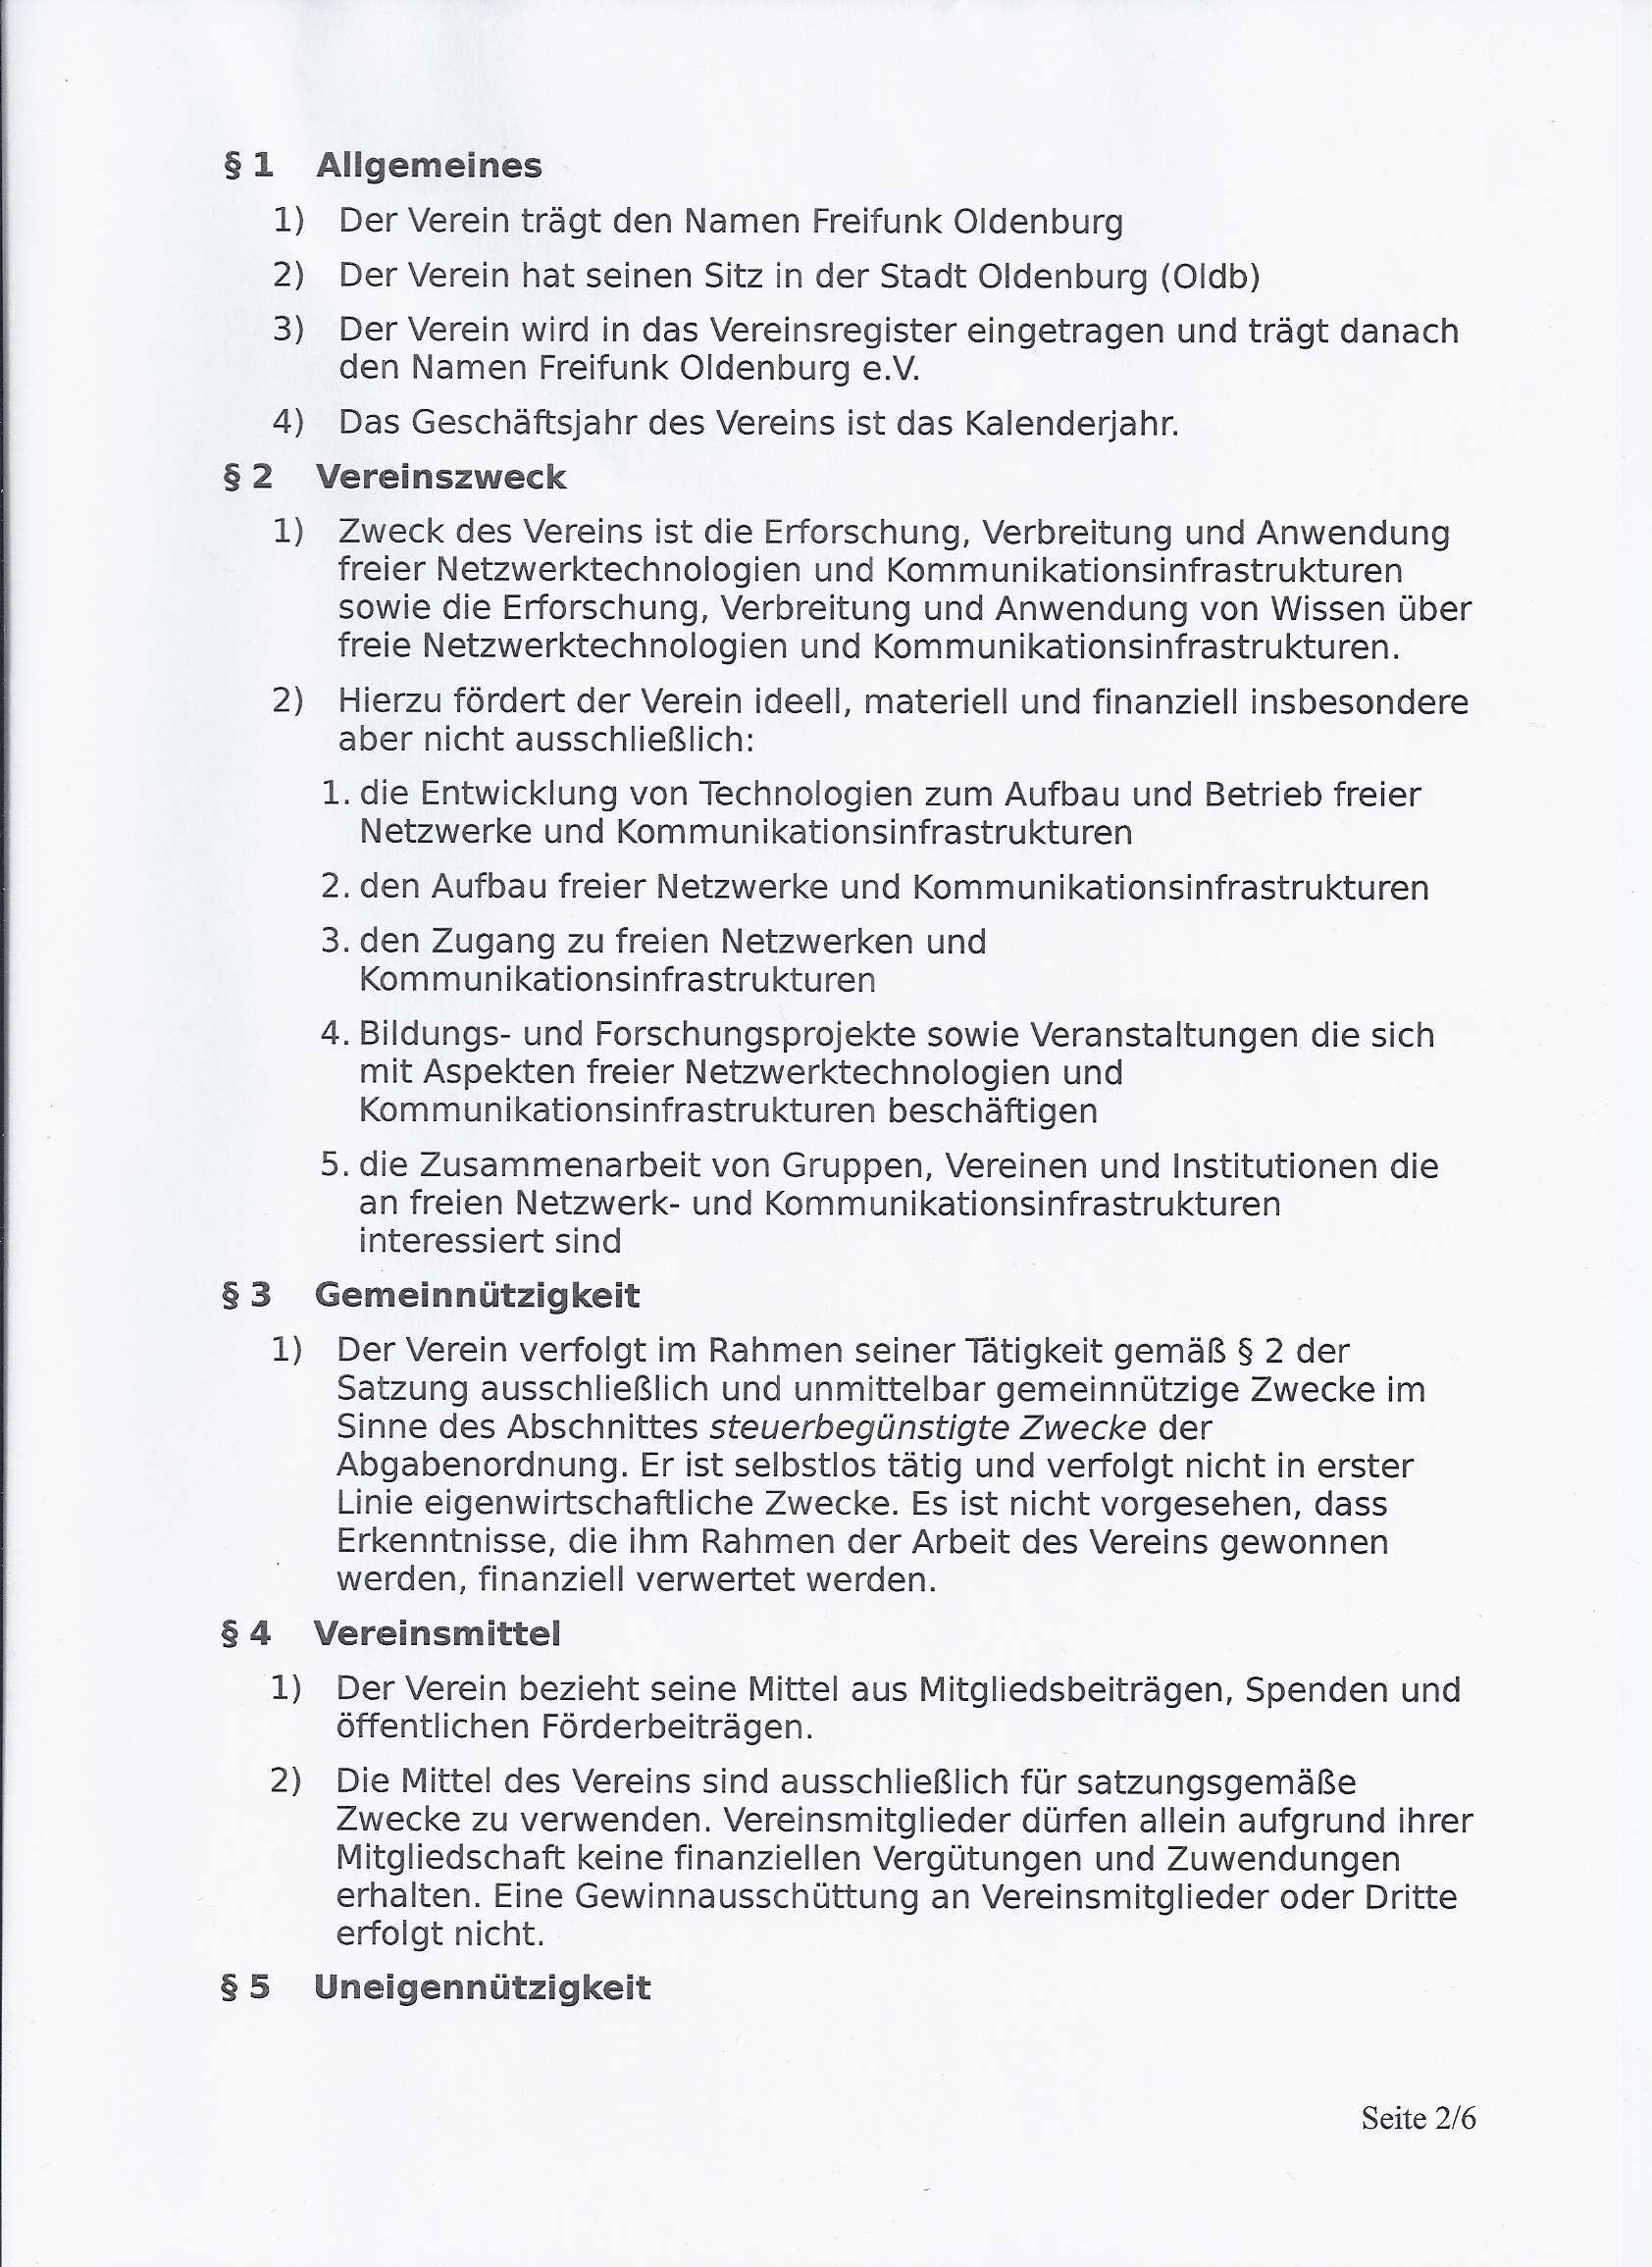 Satzung/Gründungssatzung/verein_freifunk_oldenburg_satzung_0002.jpg